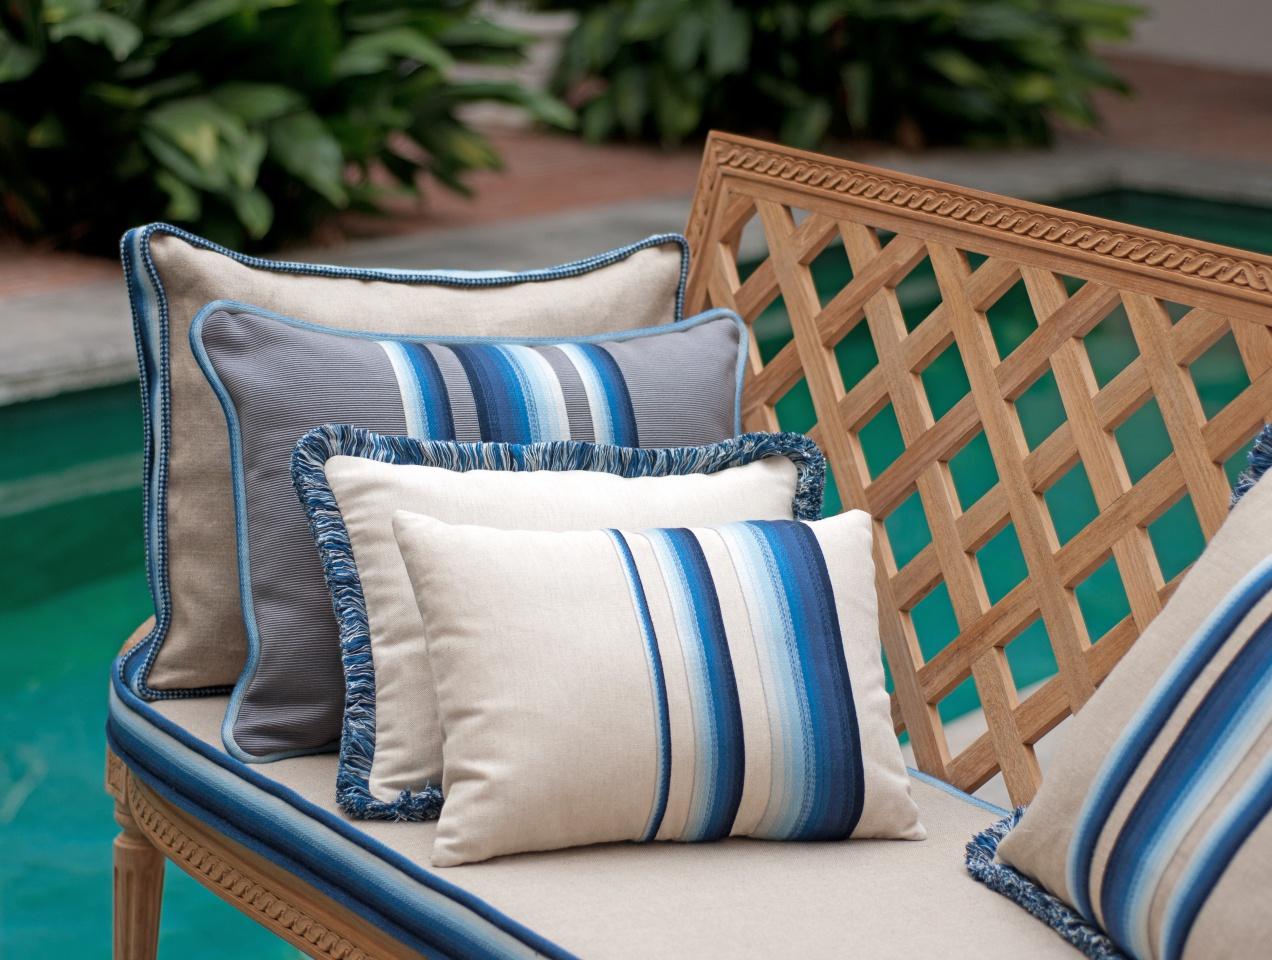 houl s les coussins prennent du galon. Black Bedroom Furniture Sets. Home Design Ideas